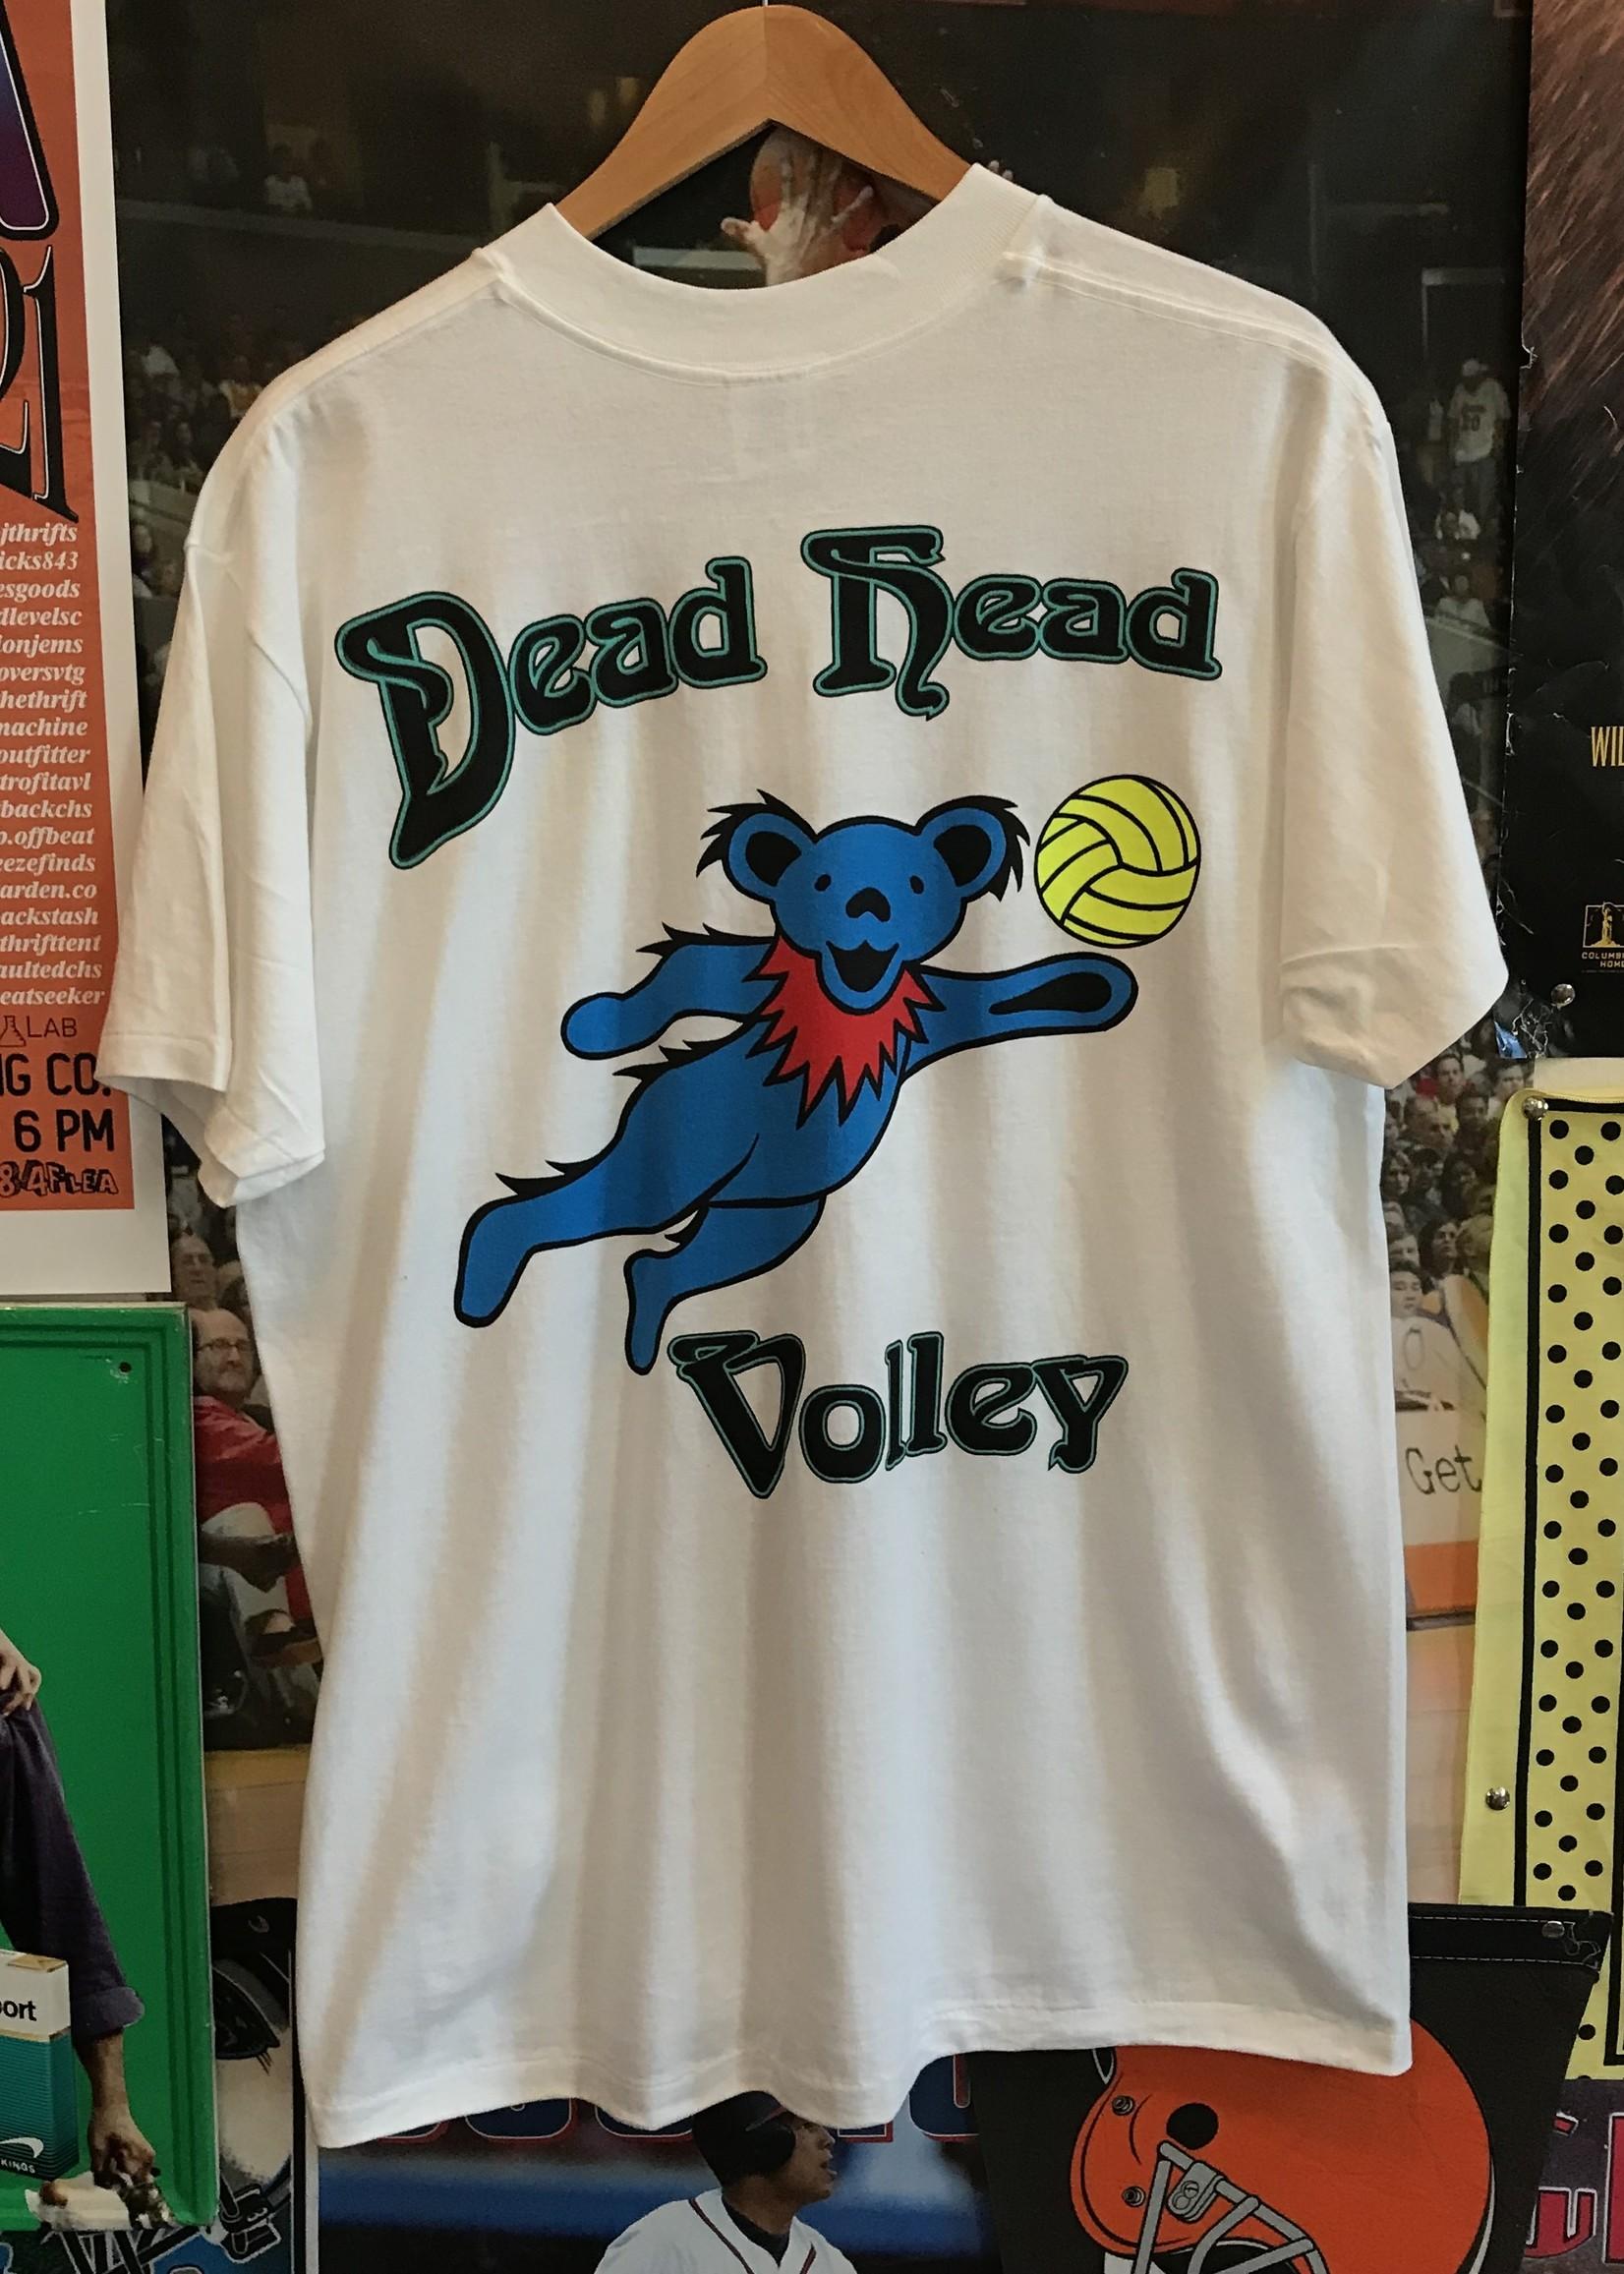 4854dead head volleyball tee sz. L